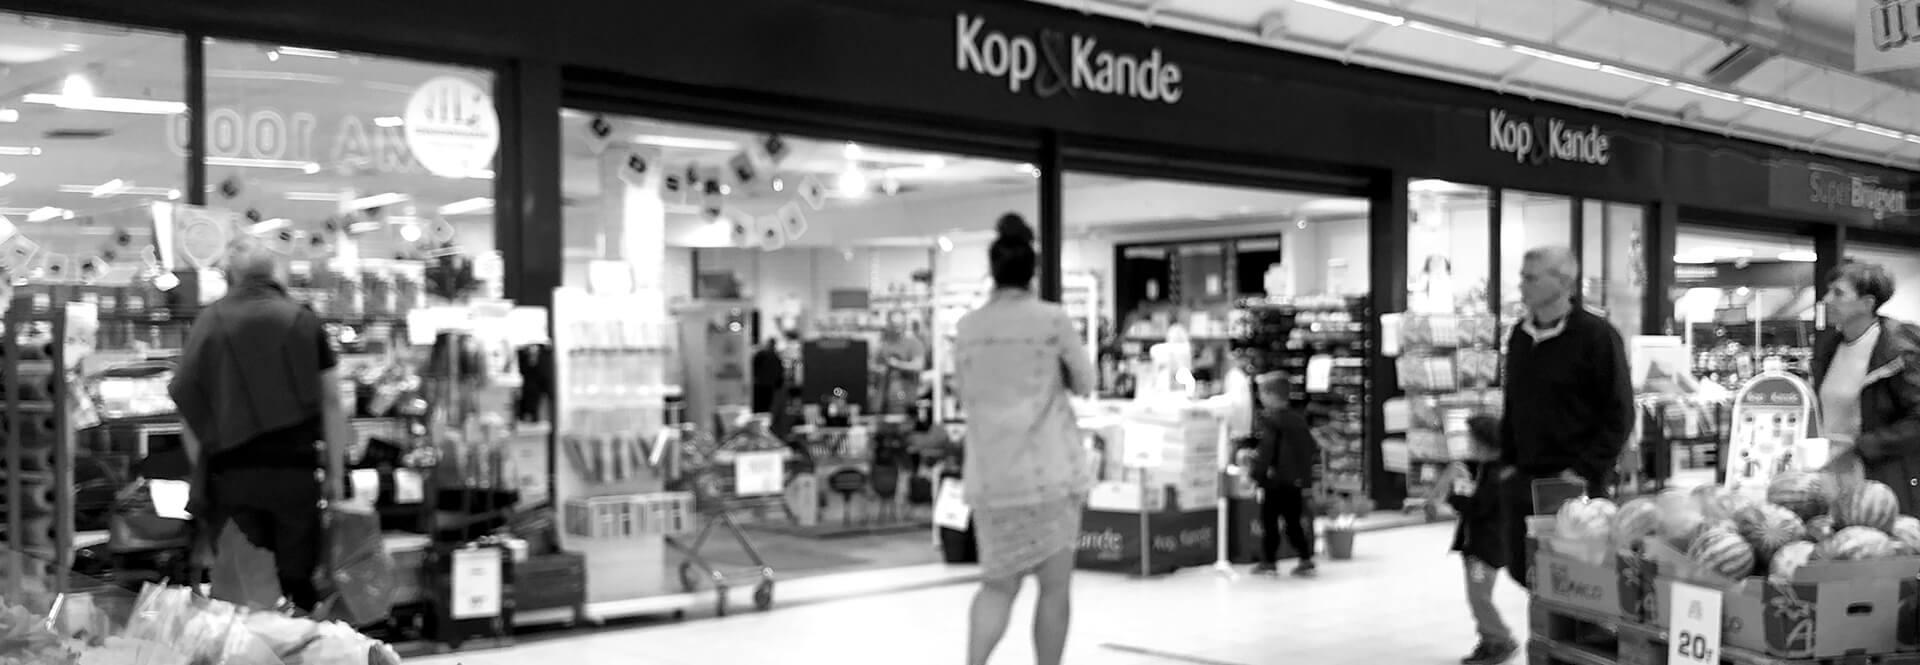 Farsø Rådhuscenter butikker